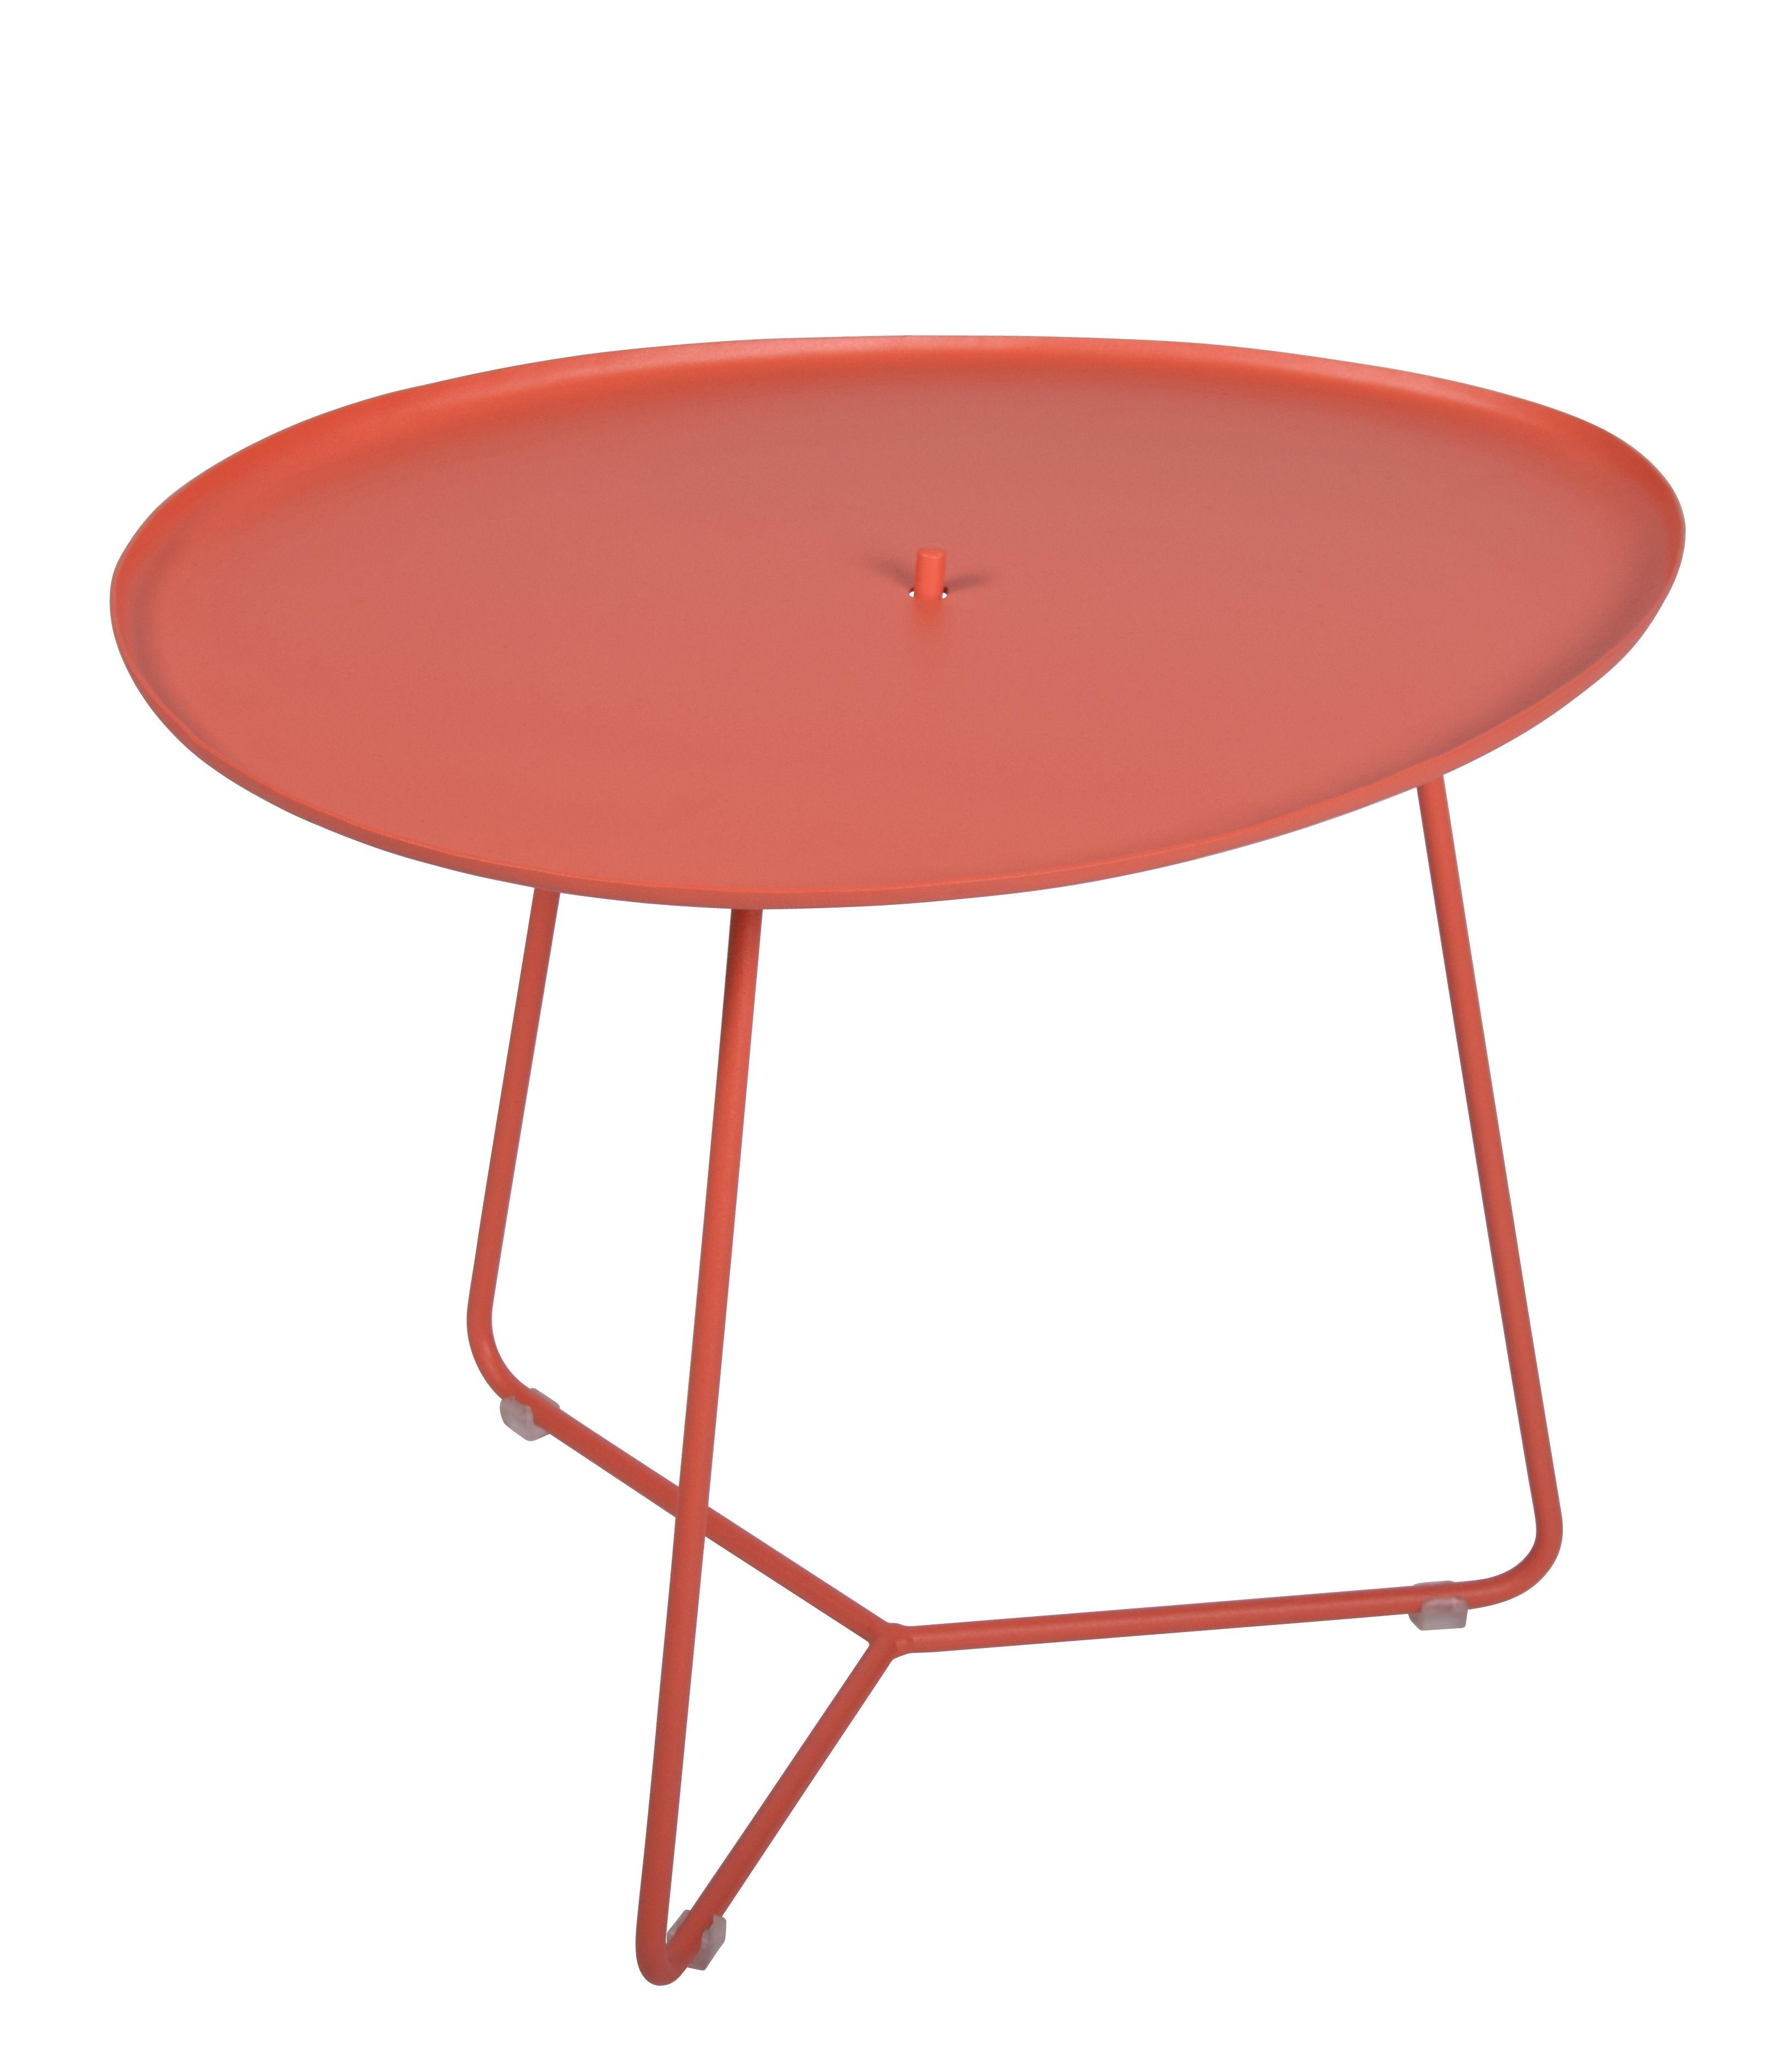 Möbel - Couchtische - Cocotte Couchtisch / L 55 cm x H 43,5 cm - abnehmbare Tischplatte - Fermob - Capucine - bemalter Stahl